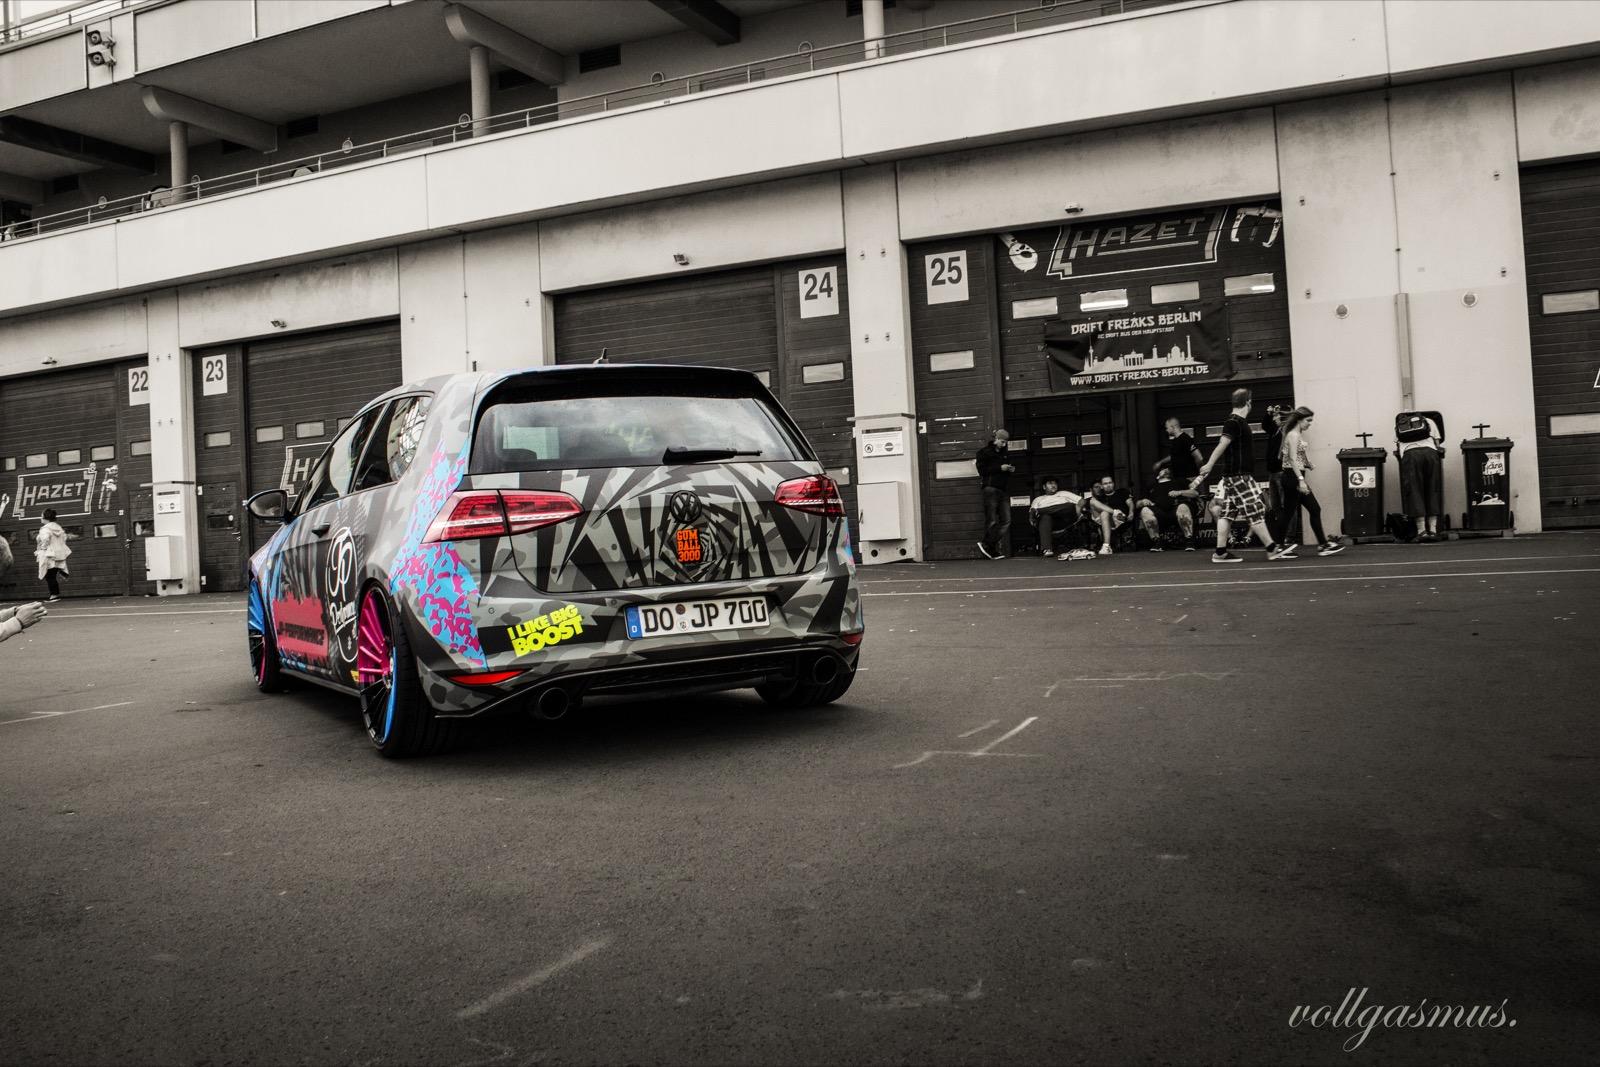 wallpaper jp performance - photo #24